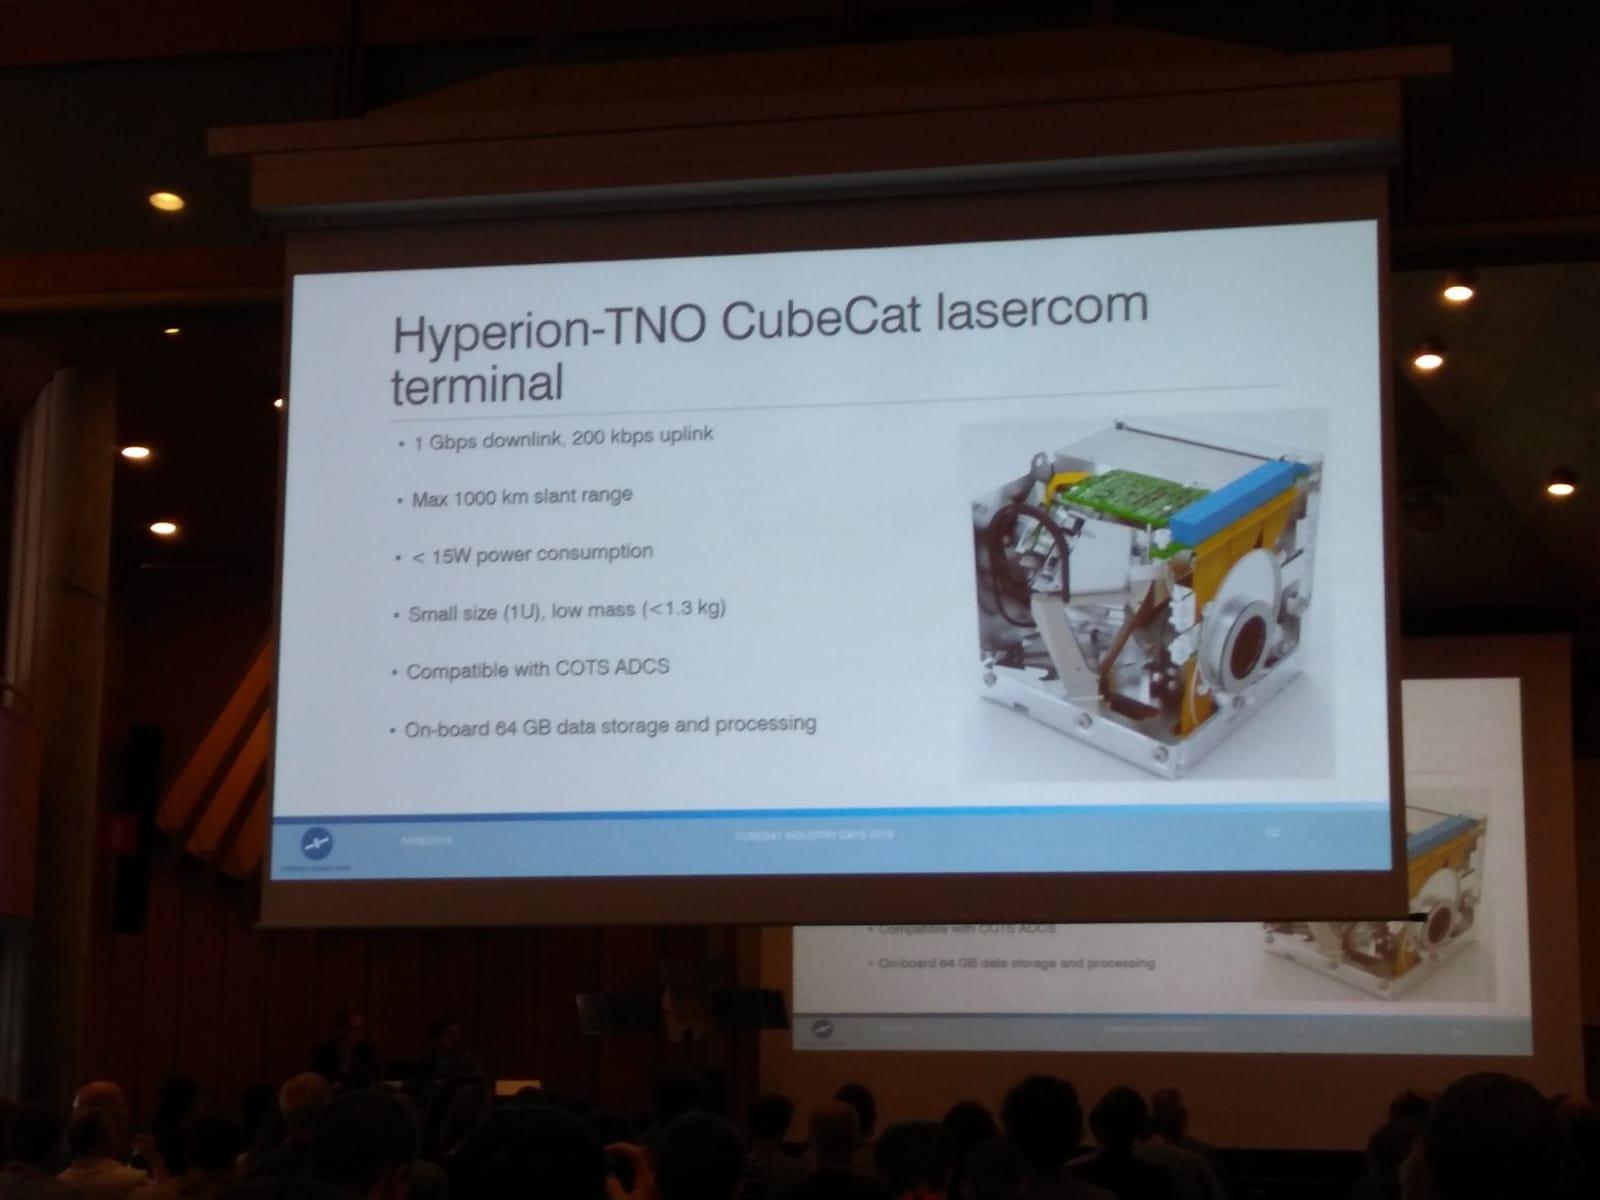 Hyperion Technologies CubeCat product